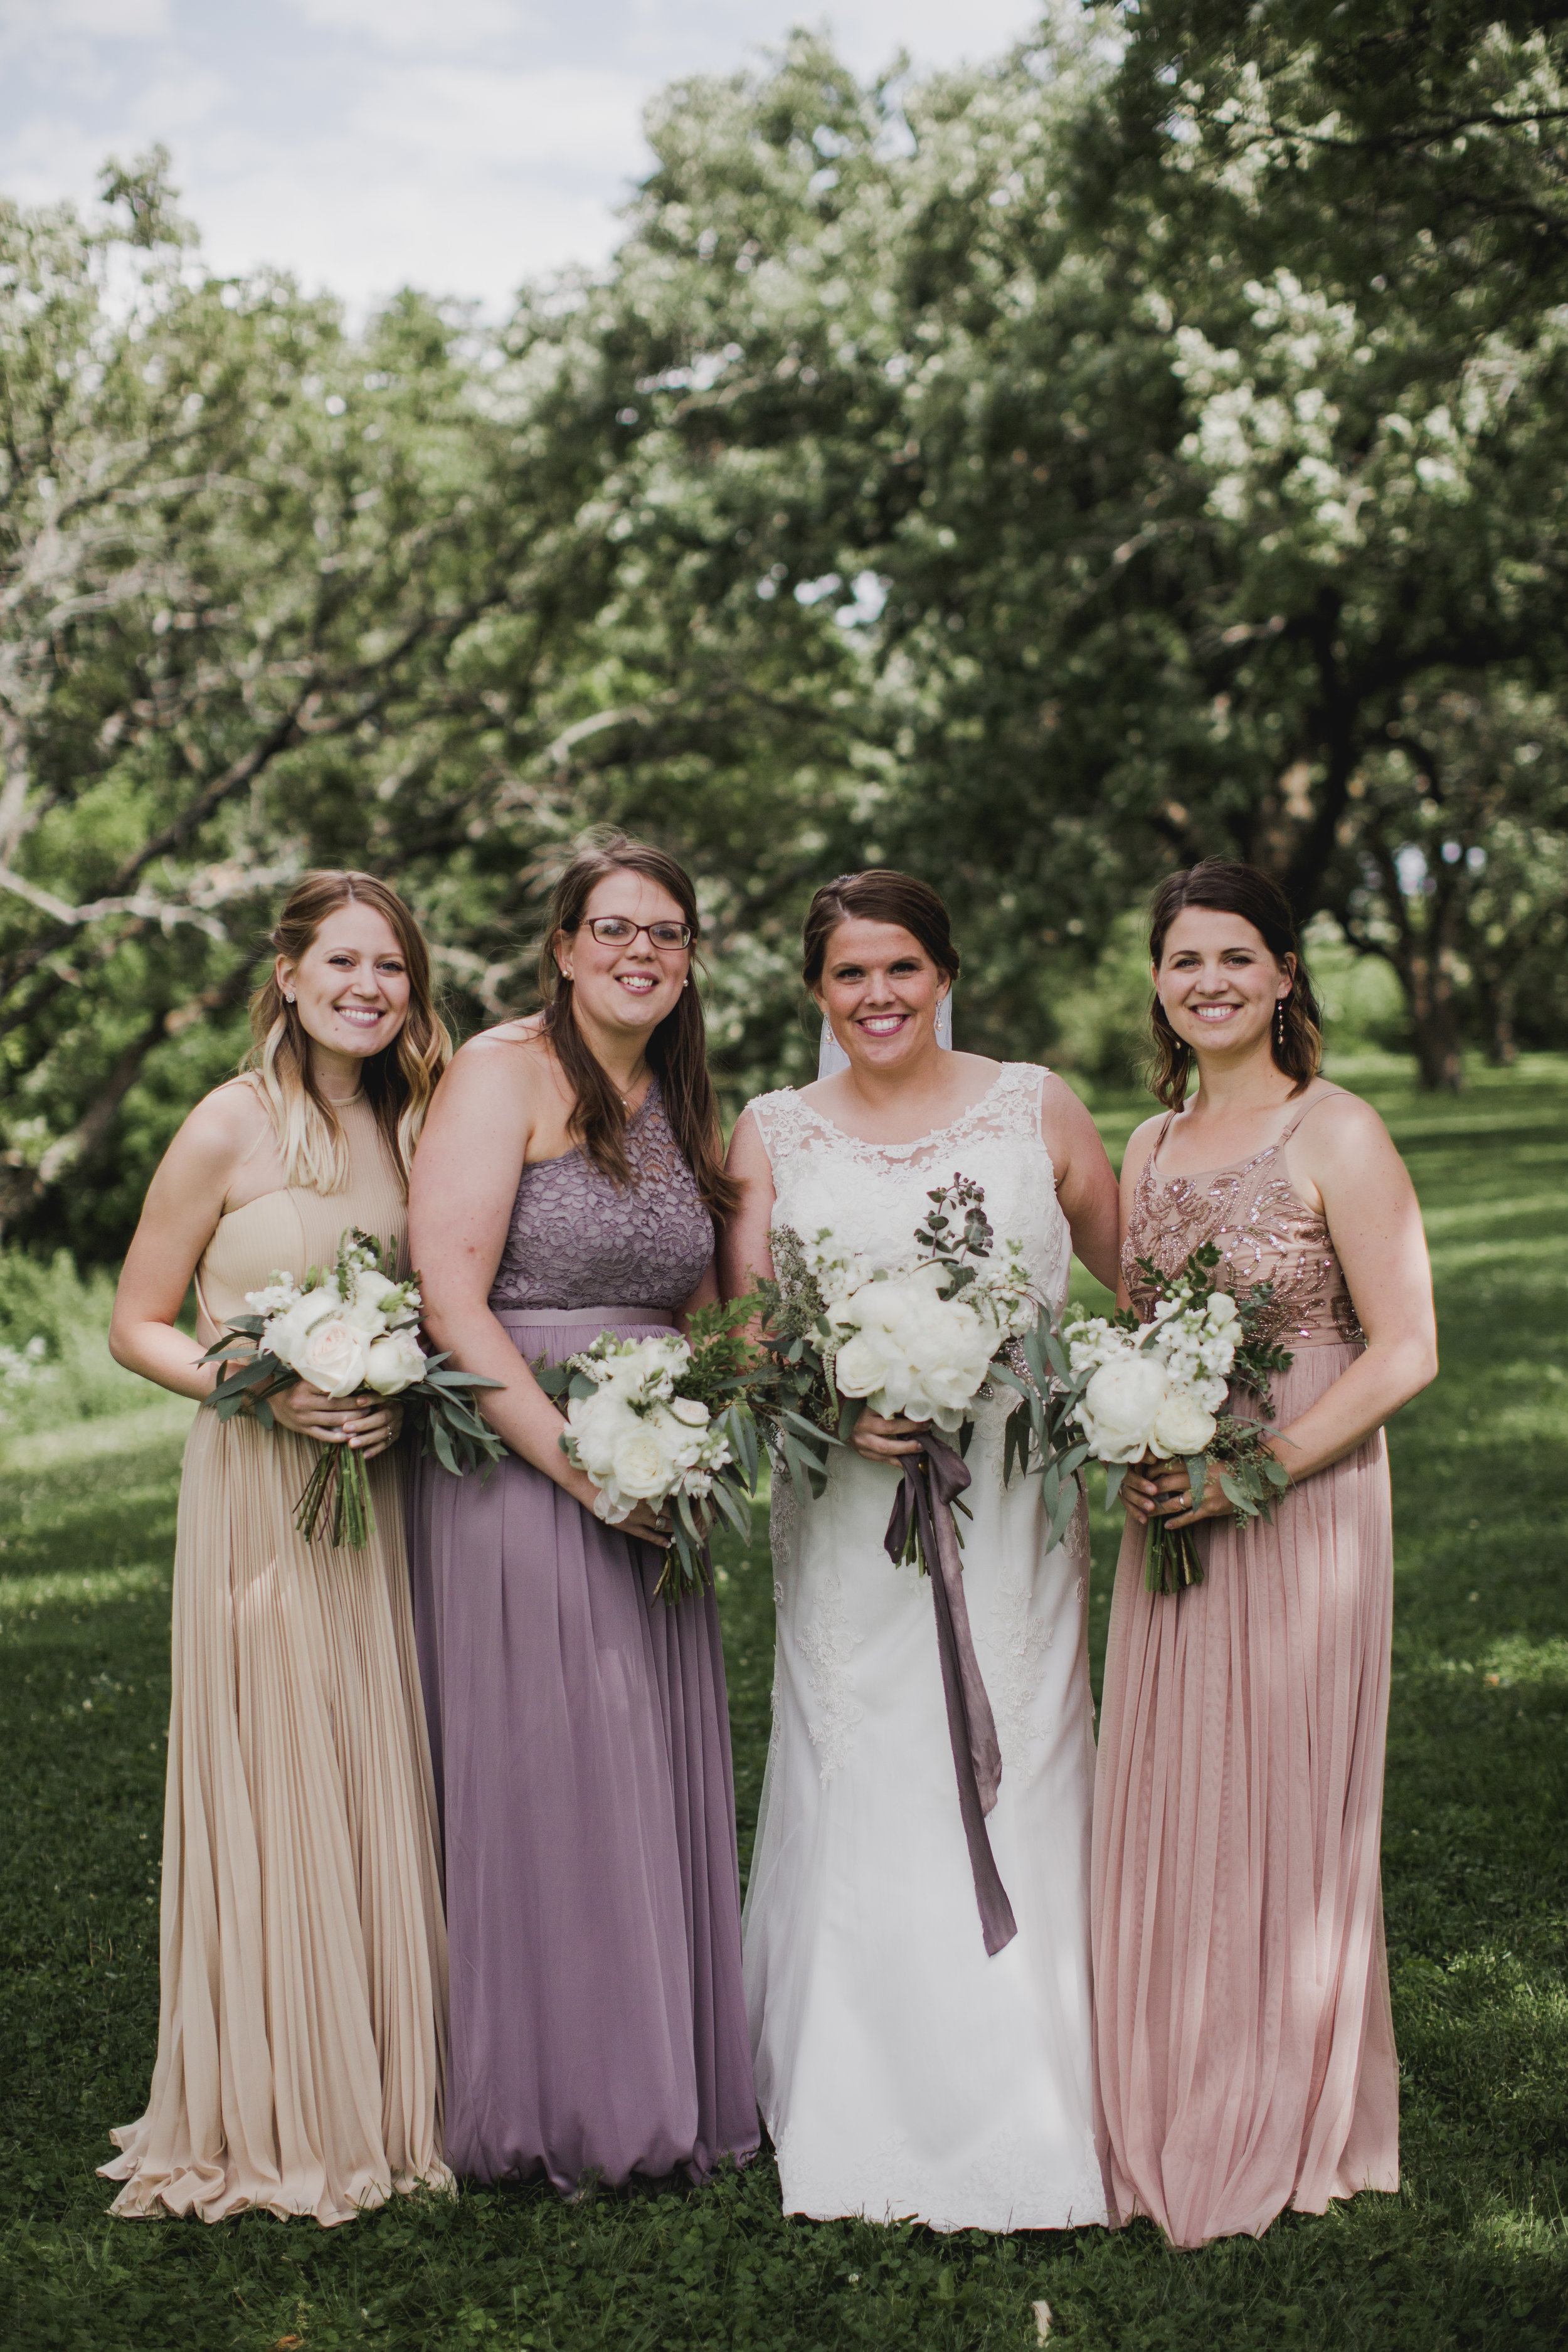 Sibyl_Sophia_Wedding_Florist_Mason_City_Diamond_Oaks_Bridesmaids.jpg